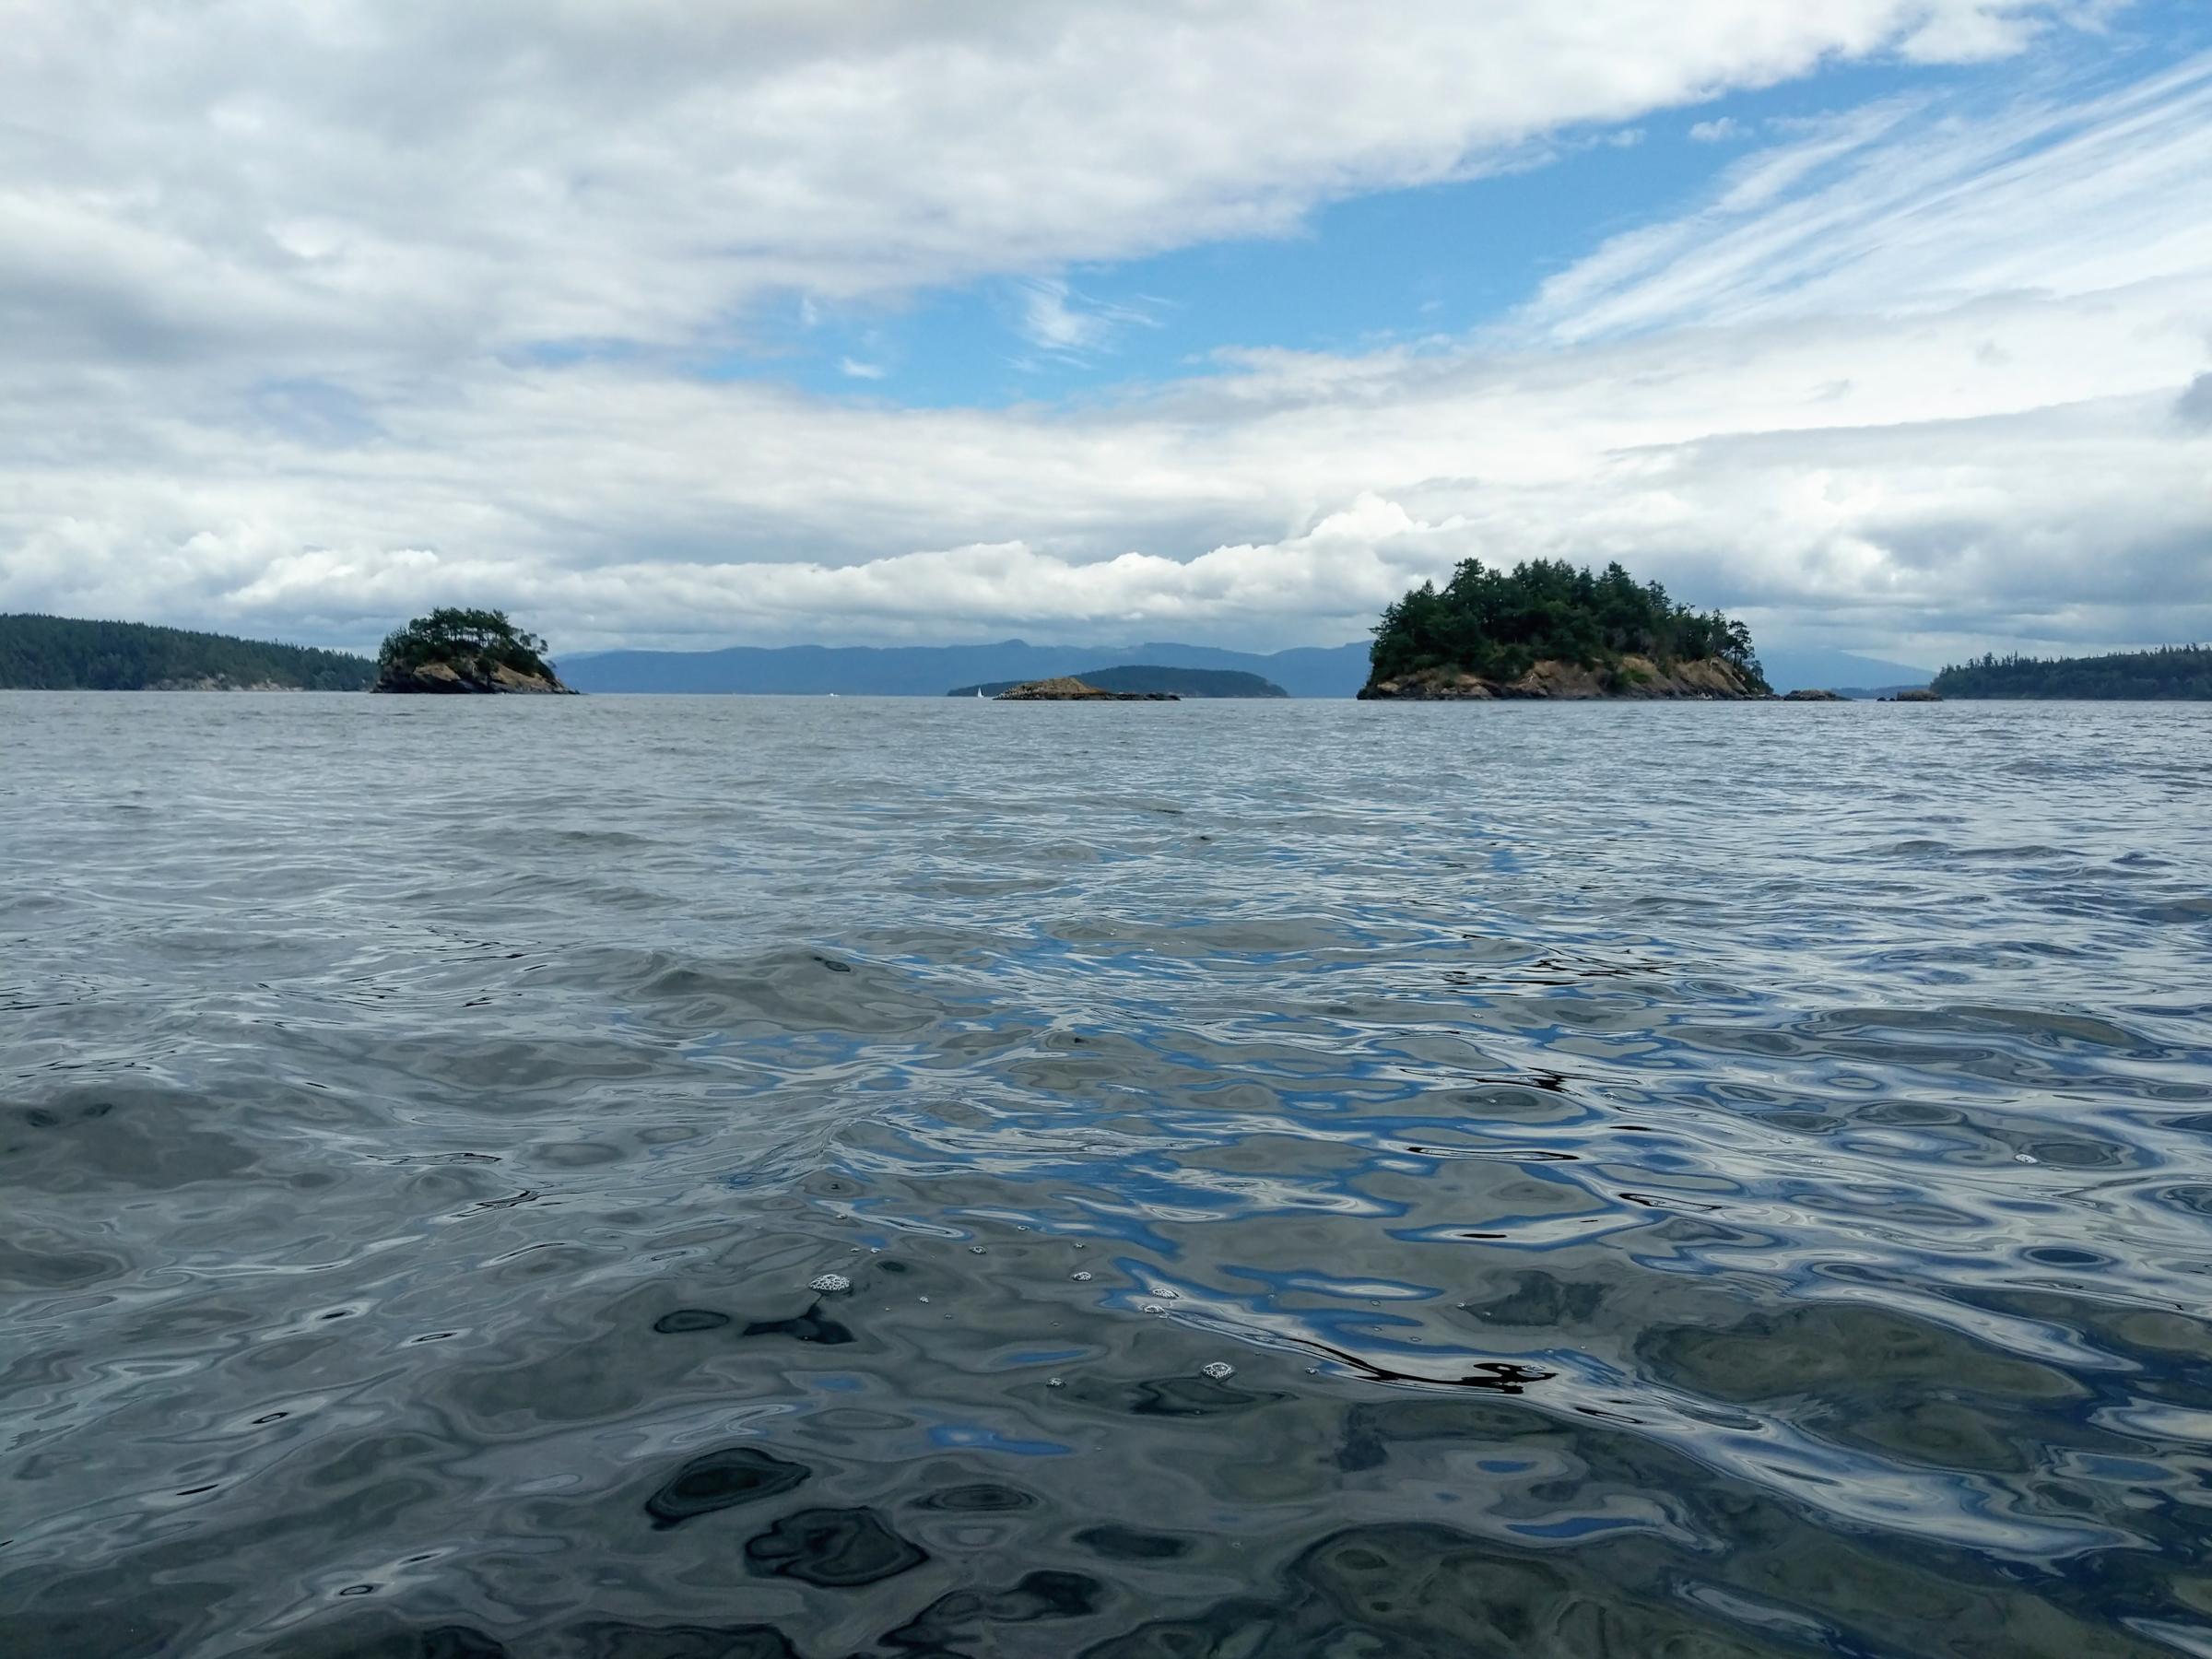 Cone Islands